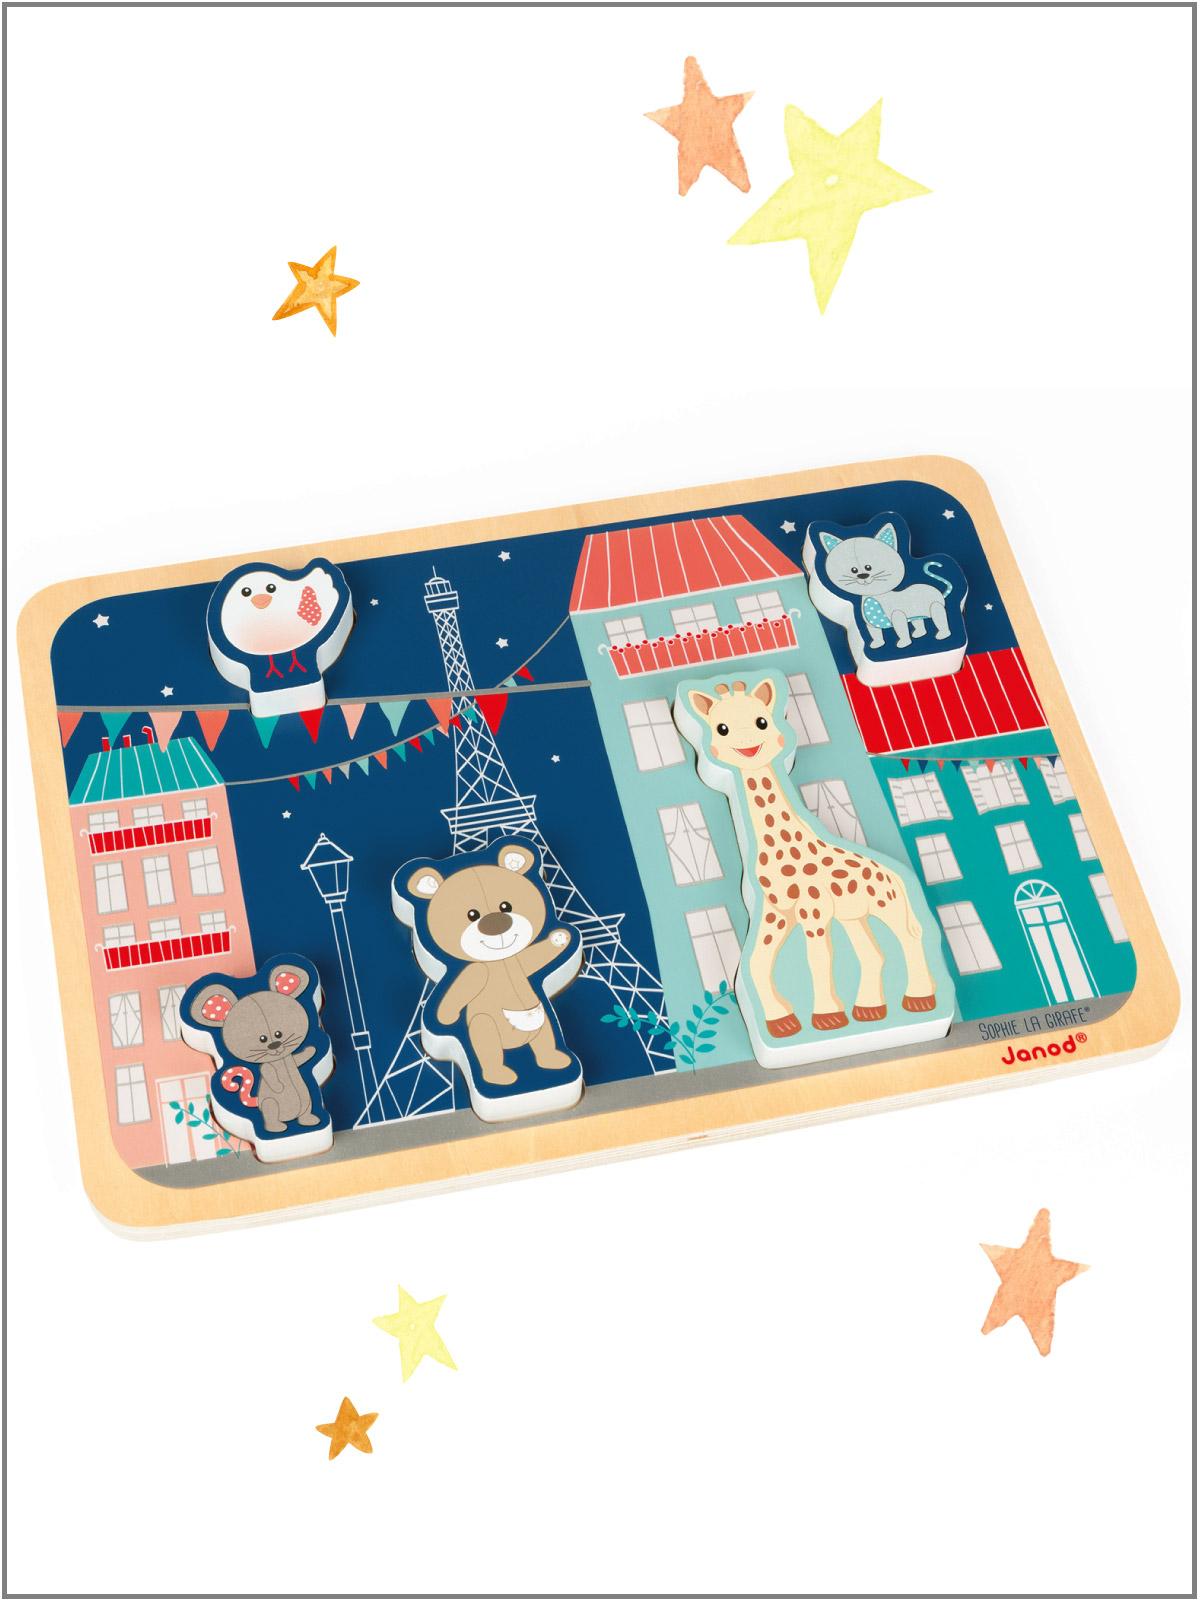 frederickandsophie-kids-toys-janod-france-sophie_la_girafe_wooden-puzzle